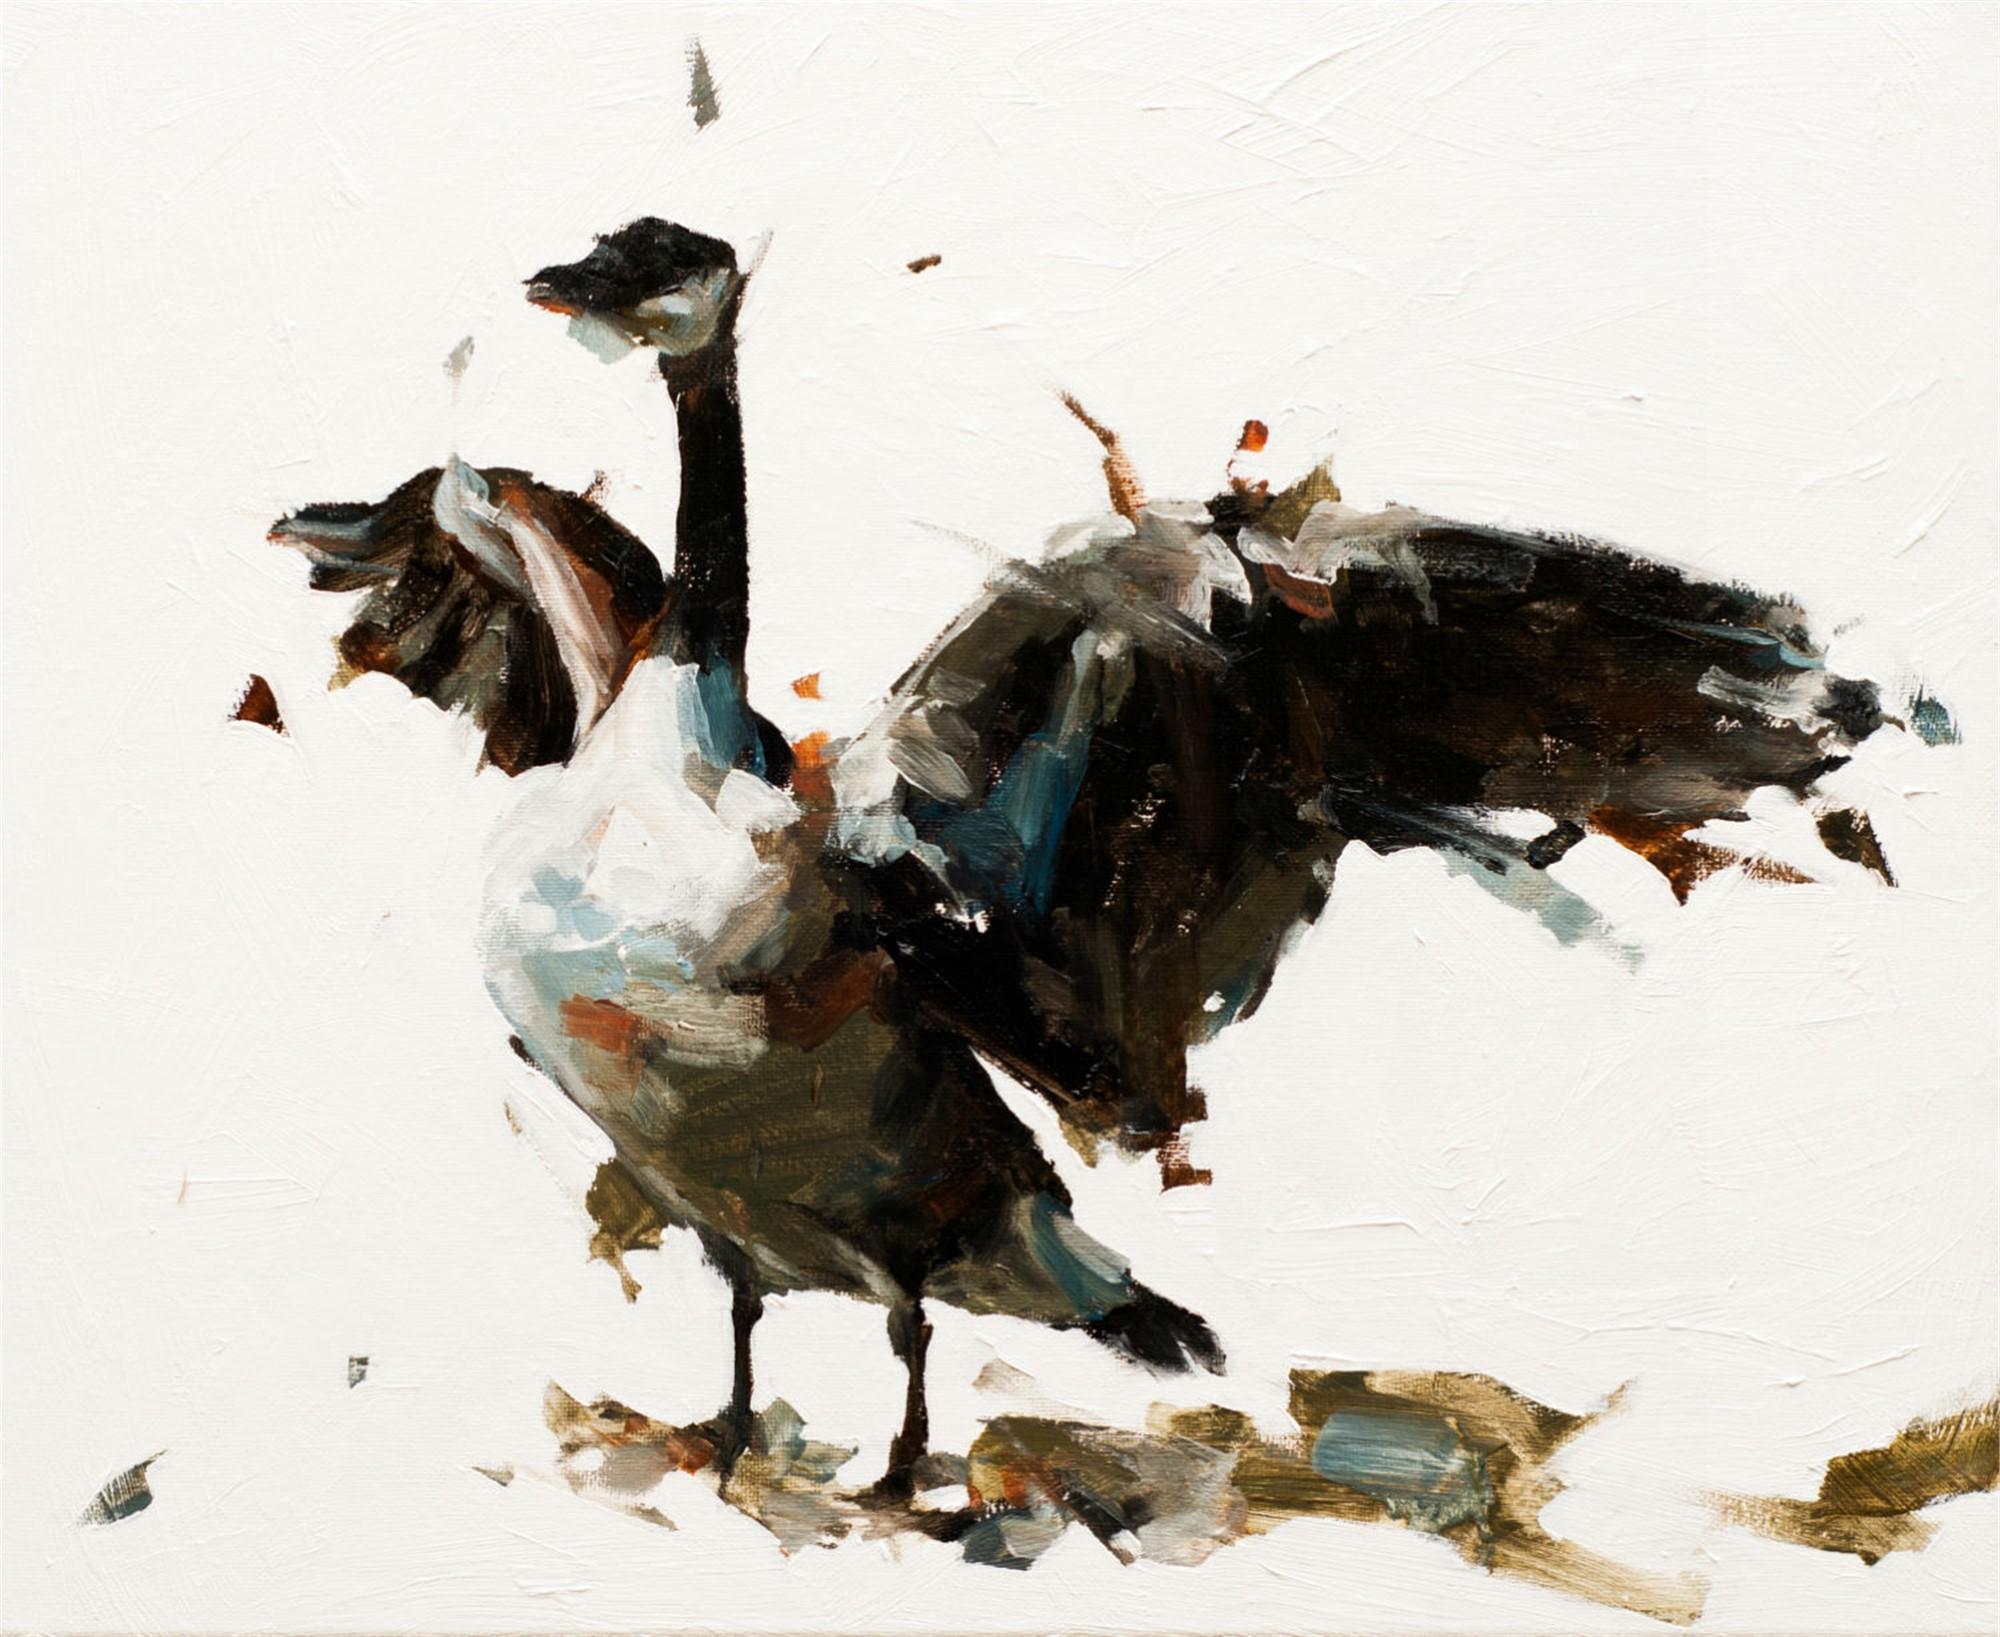 Goose III by Thibault Jandot